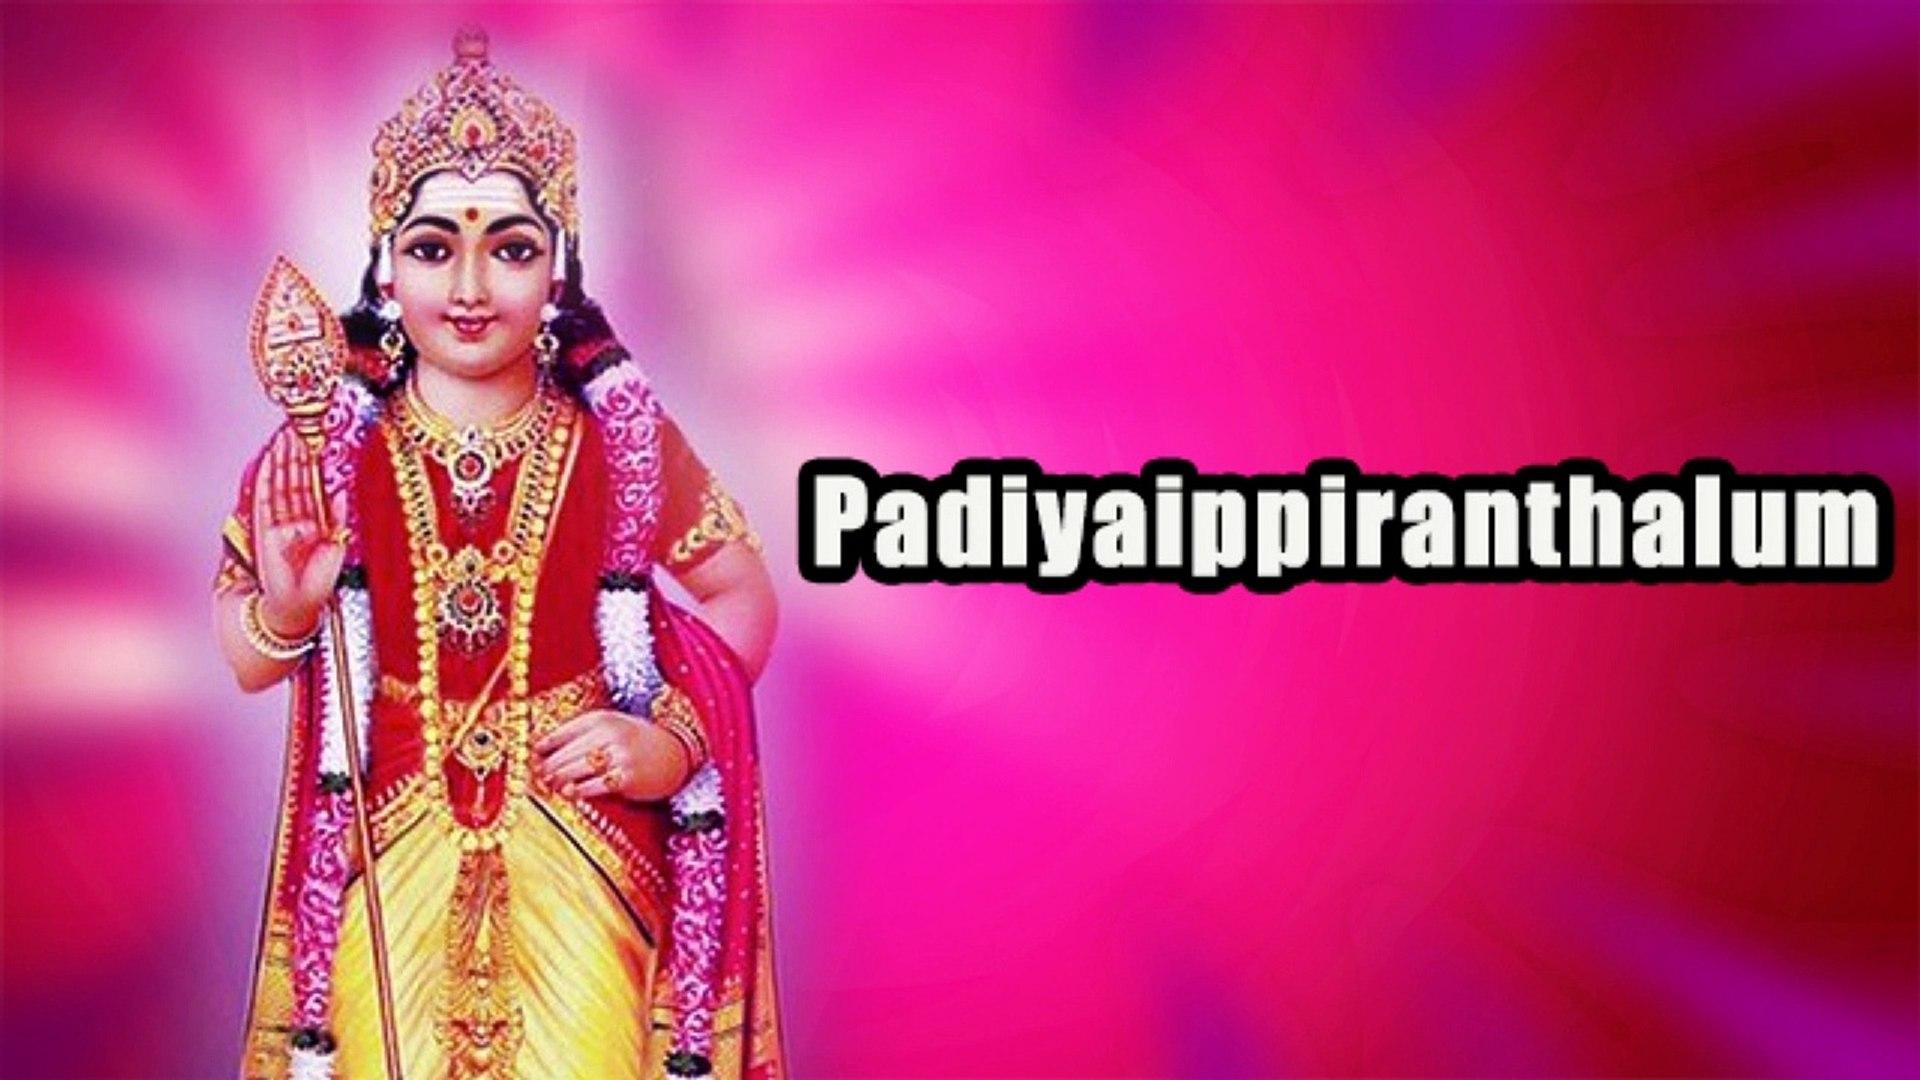 Padiyaippiranthalum - Lord Murugan Tamil Devotional Songs ¦ Latest Tamil Devotional Songs